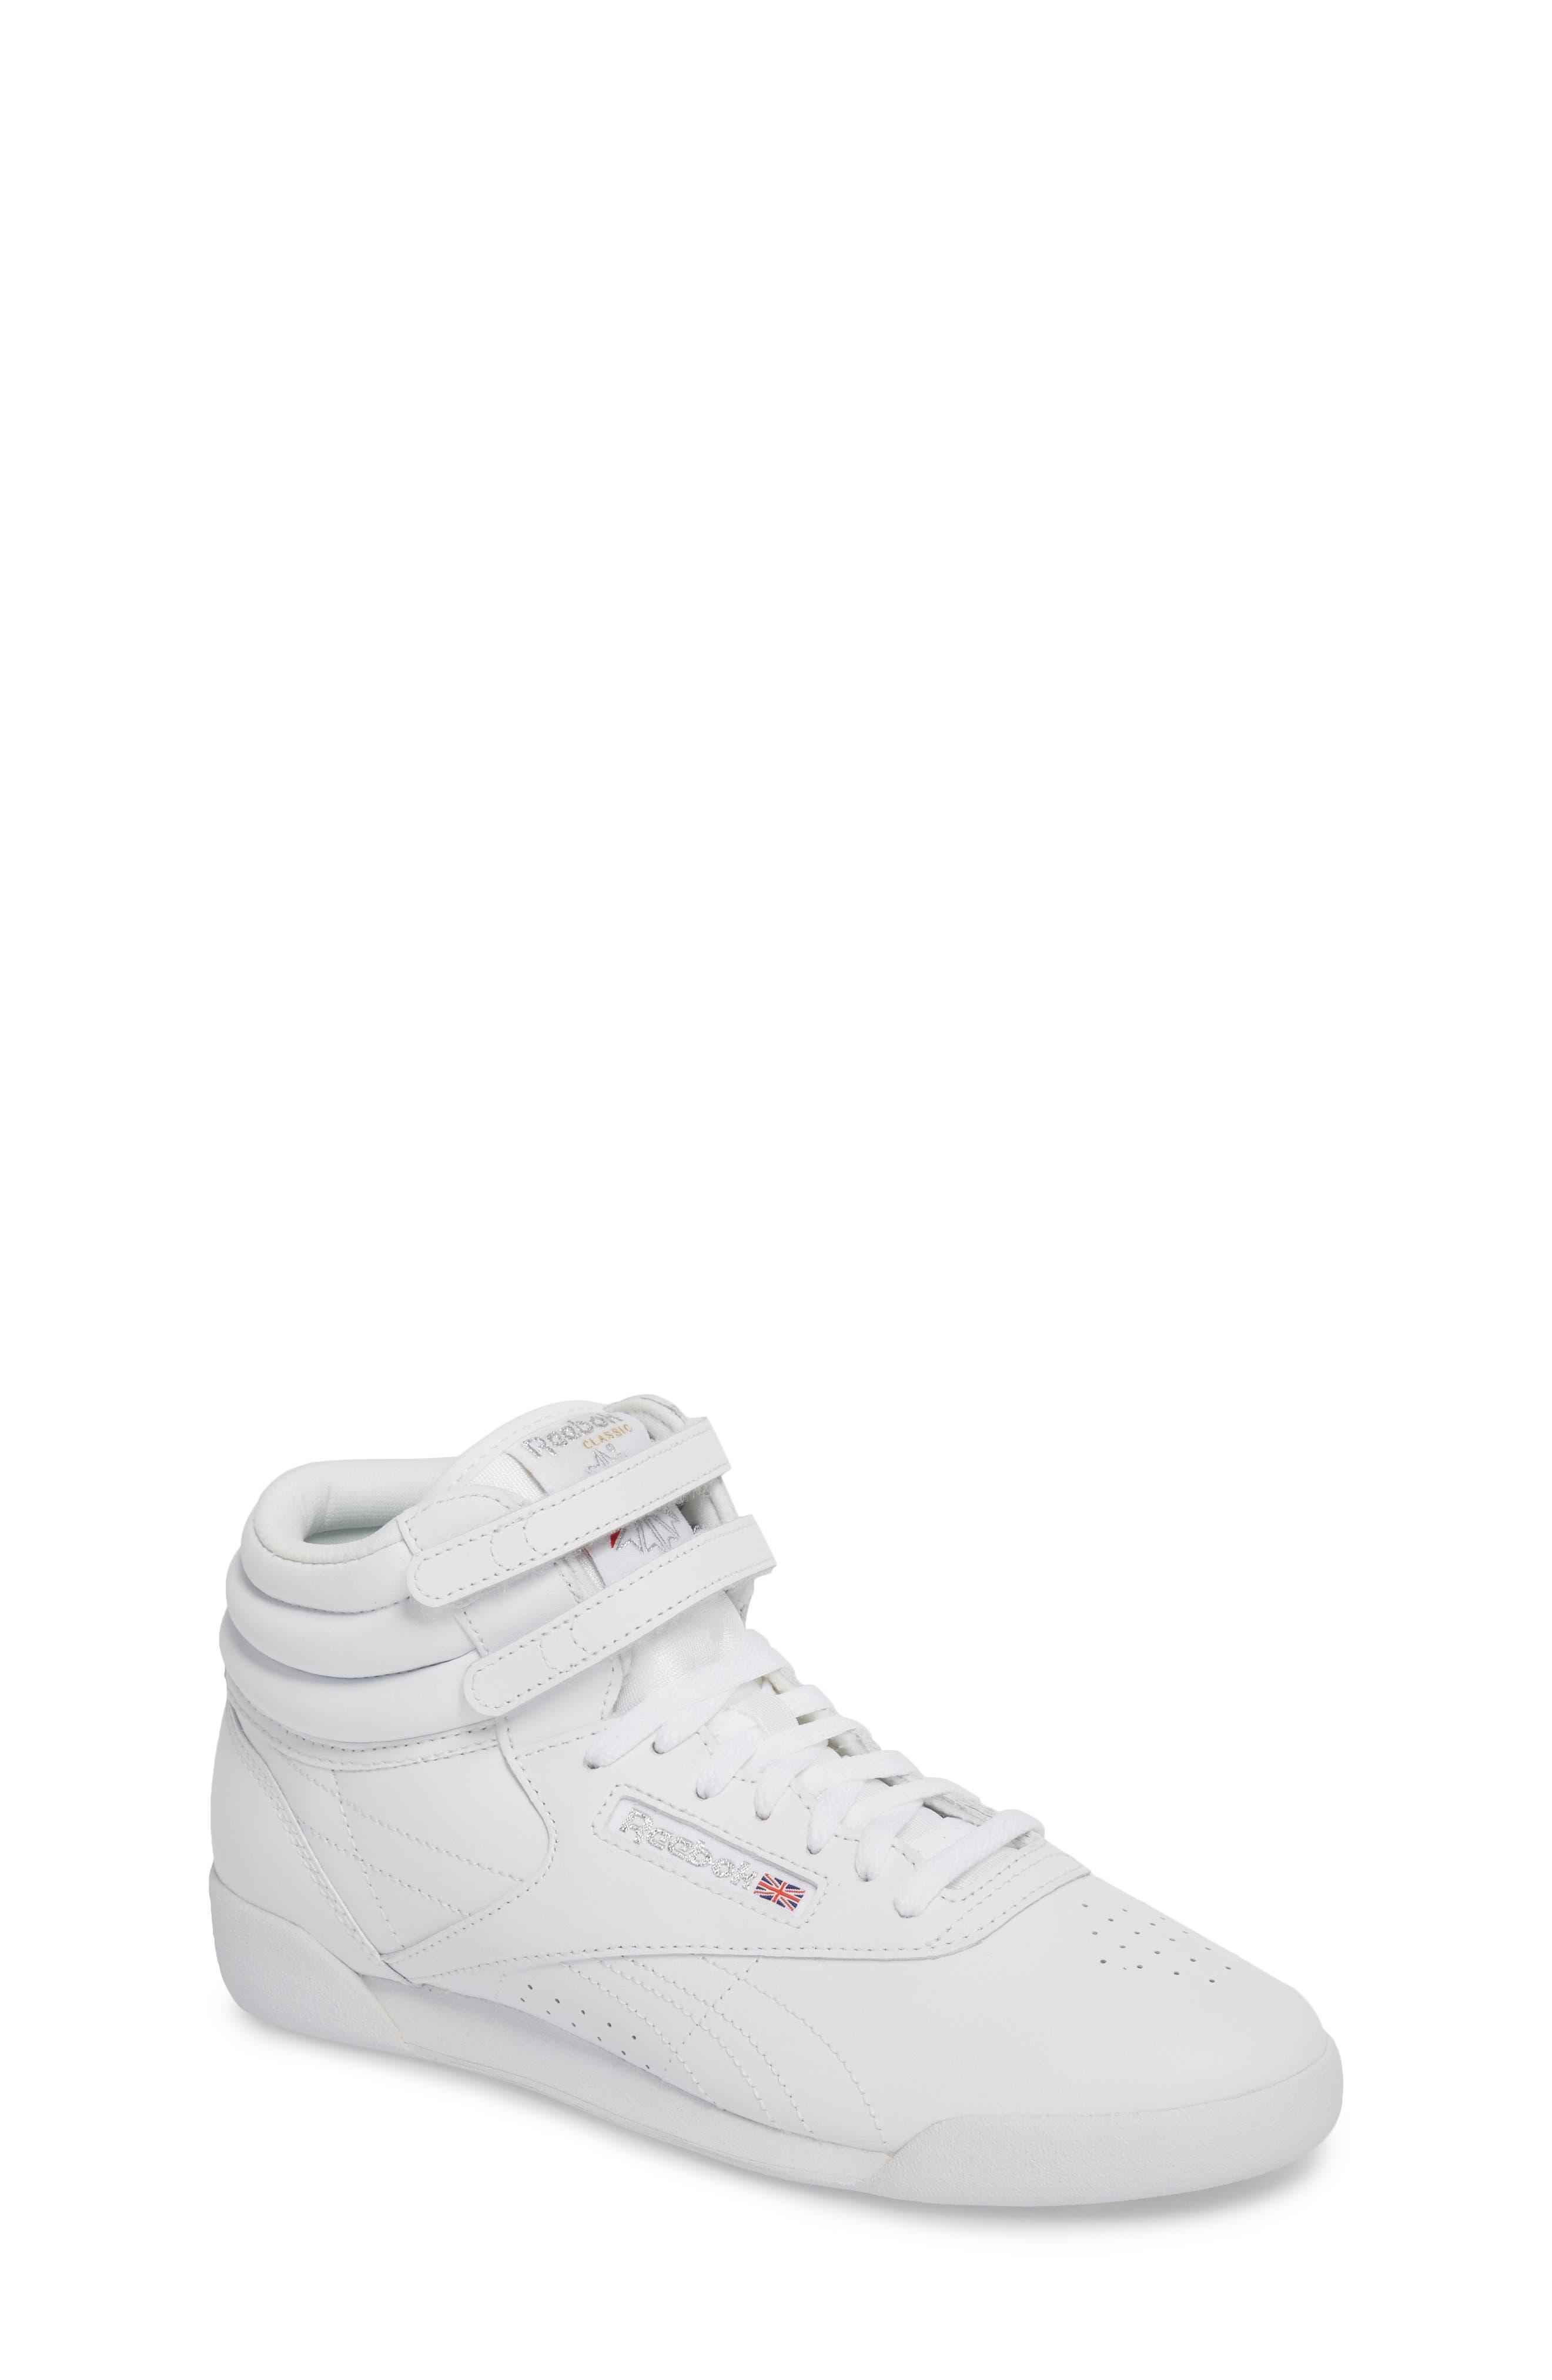 Freestyle Hi Sneaker,                         Main,                         color, WHITE/ SILVER